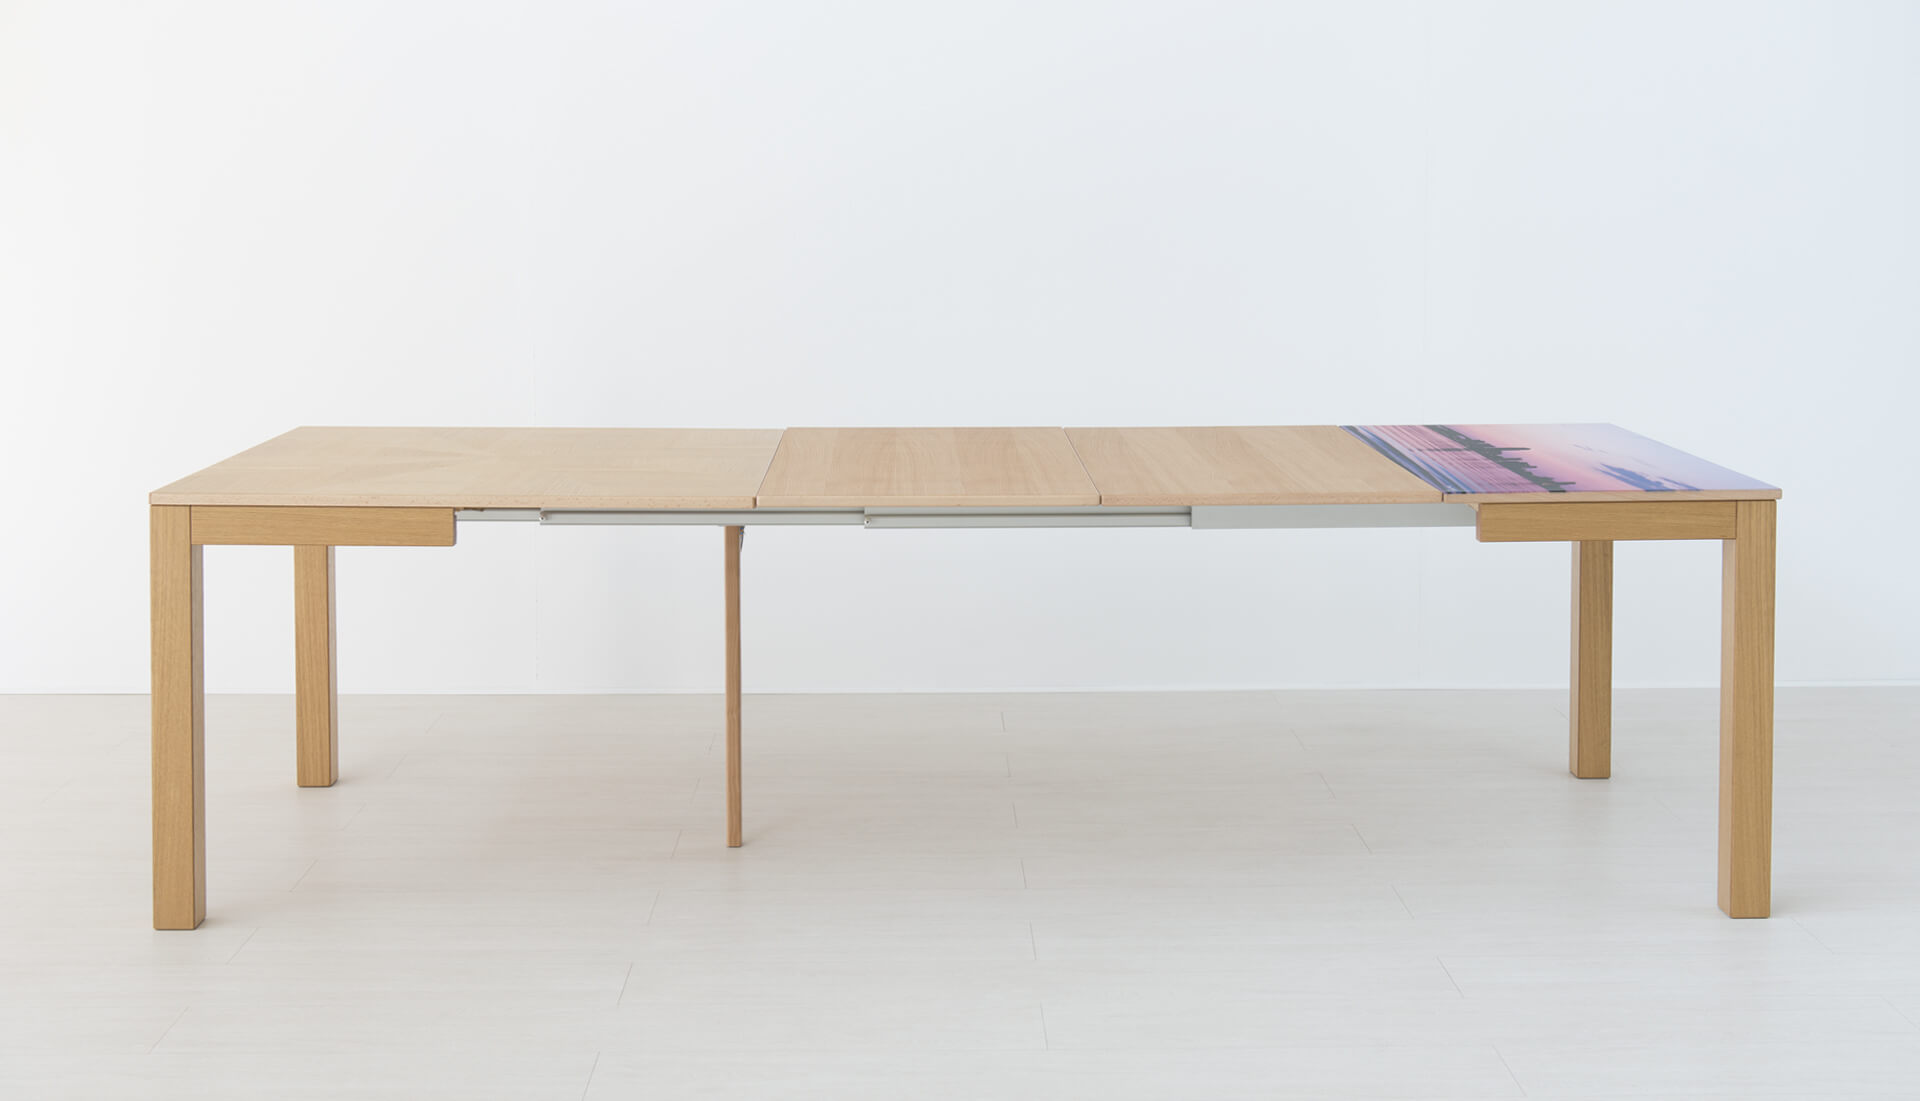 Emejing tavoli da terrazzo allungabili ideas amazing - Tavoli da terrazzo ikea ...